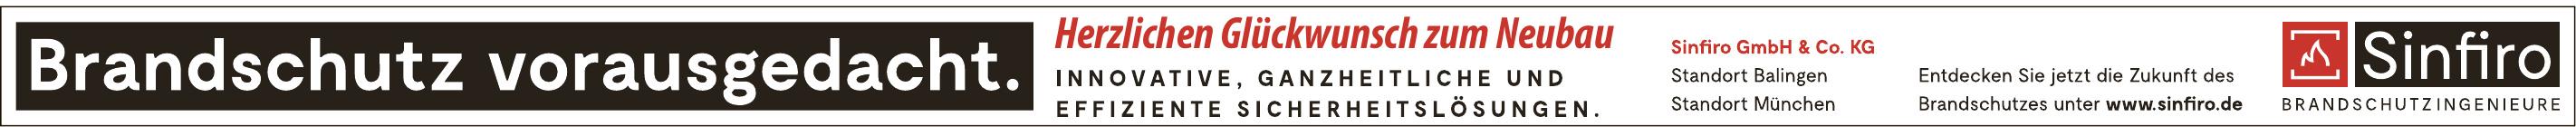 Sinfiro GmbH & Co. KG